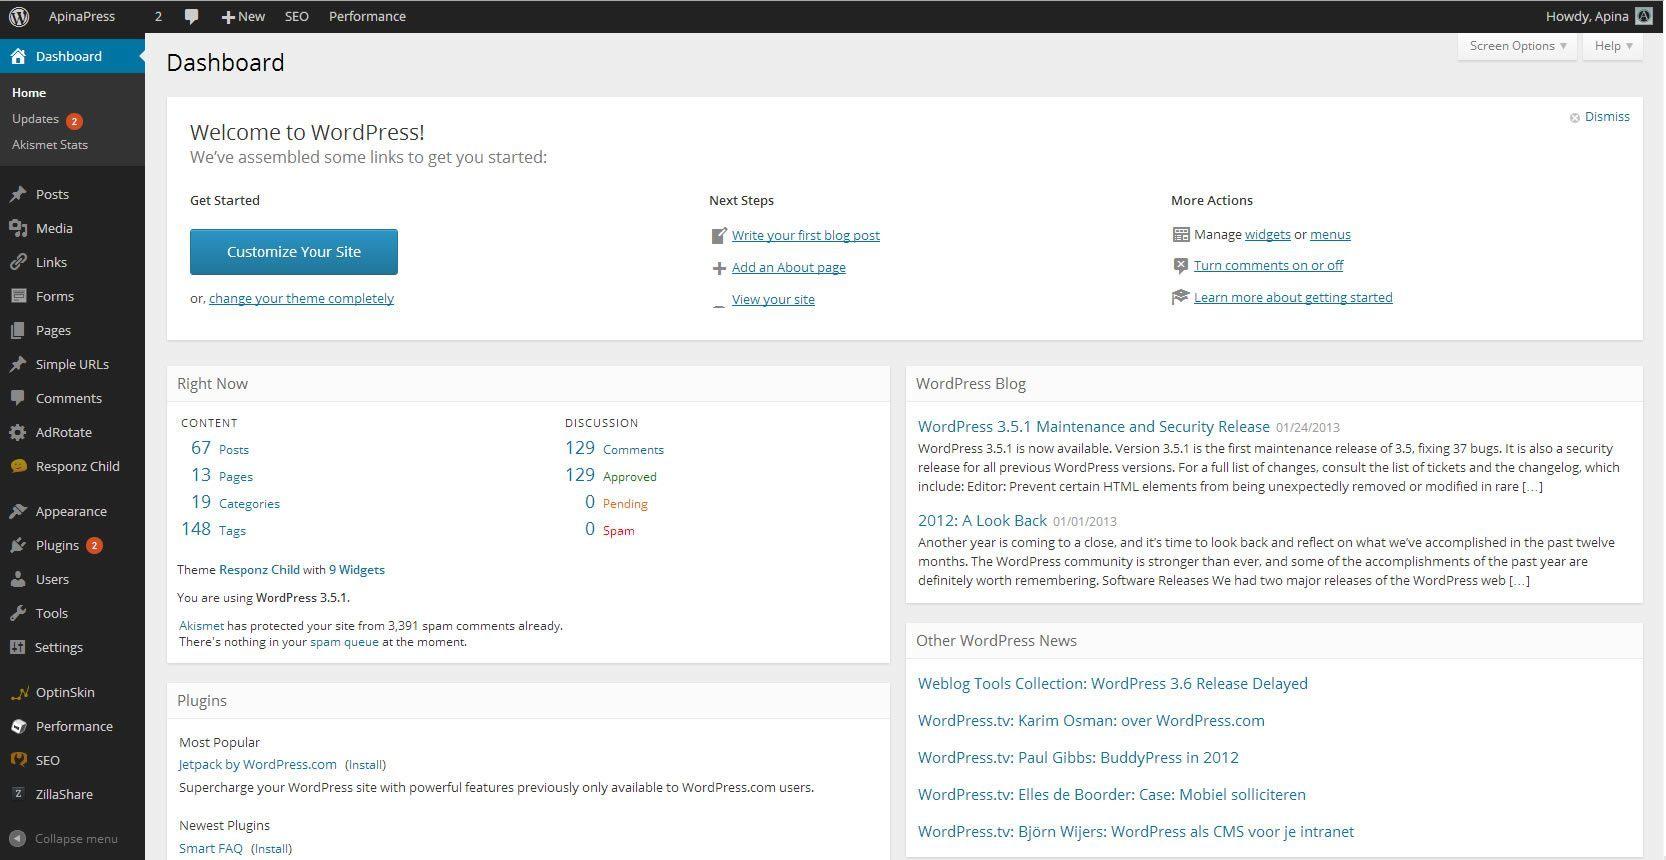 new_wordpress_dashboard_look